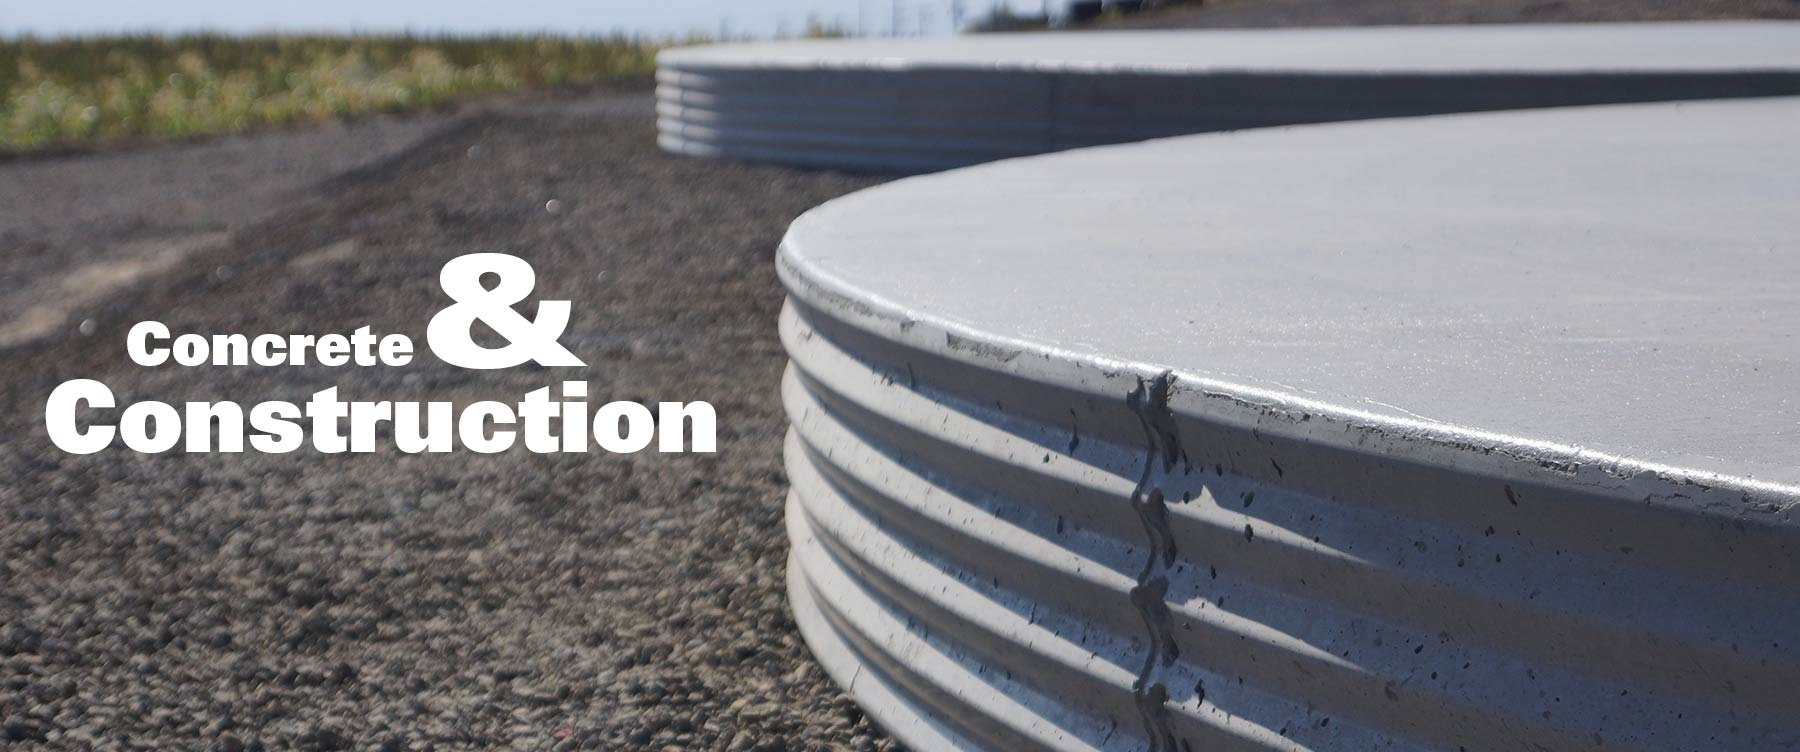 T Amp S Sales Building Scafco Grain Bins From Concrete To